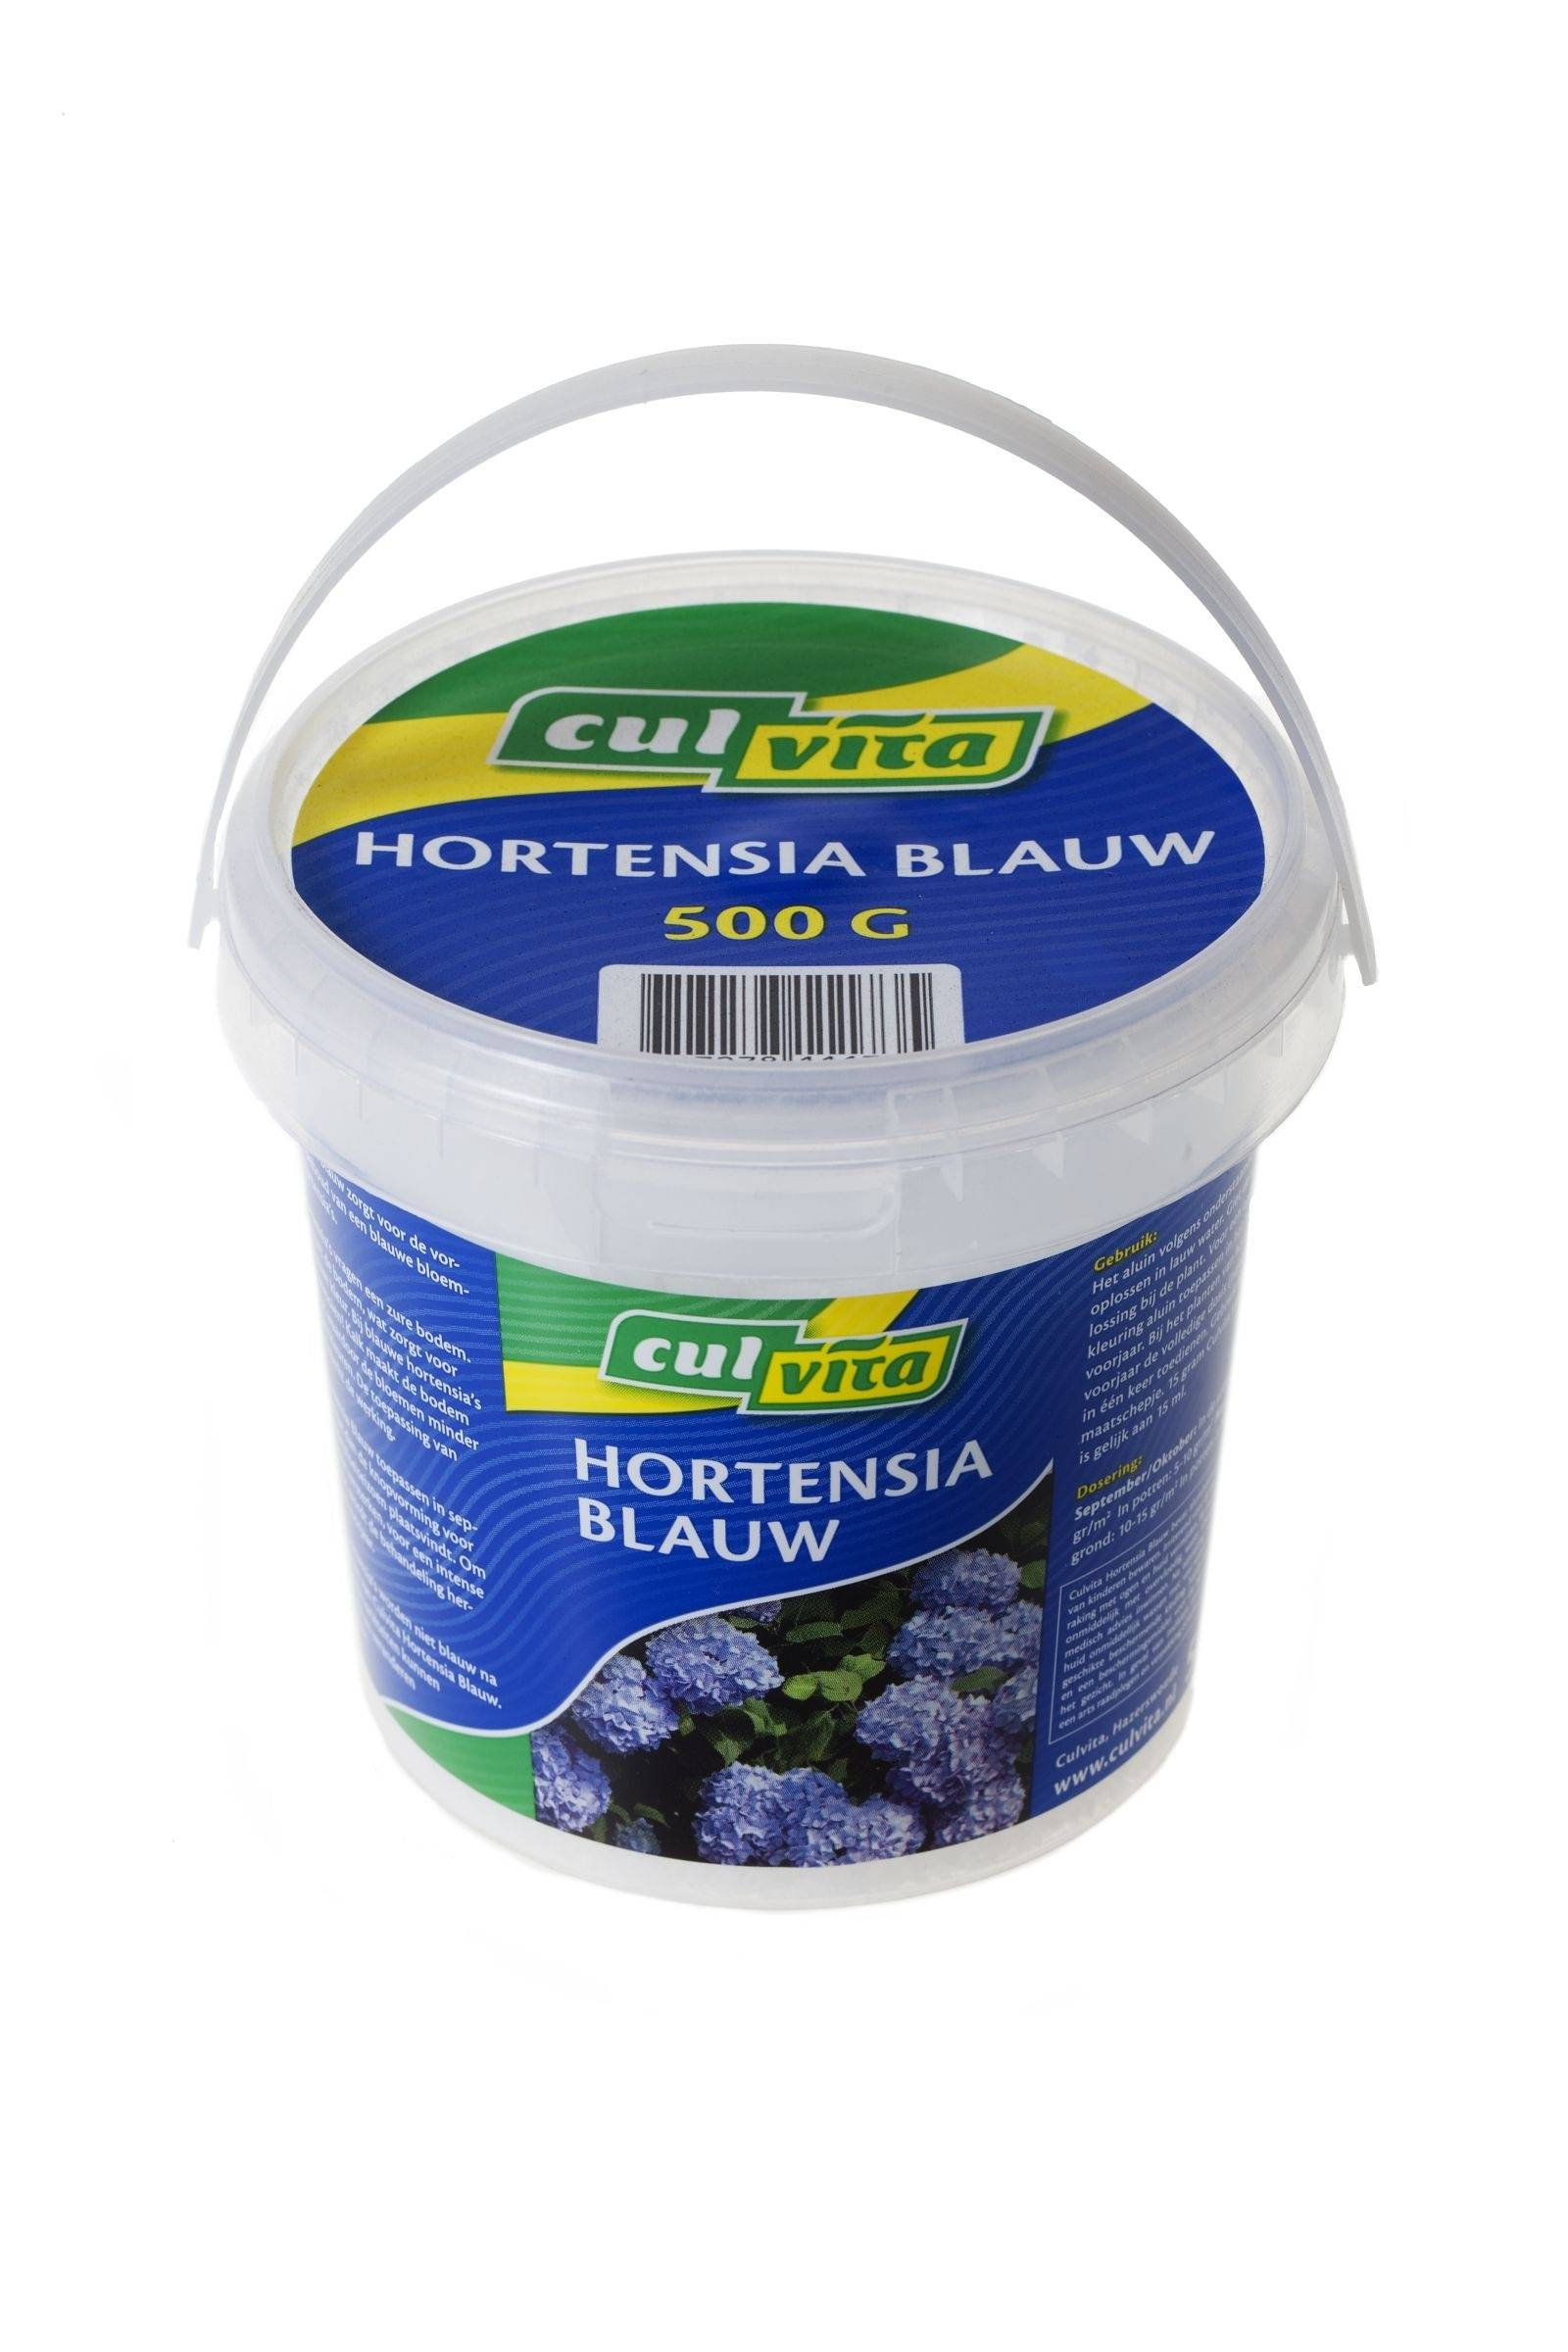 Hortensia Blauwmaker Maakt uw hortensia blauw